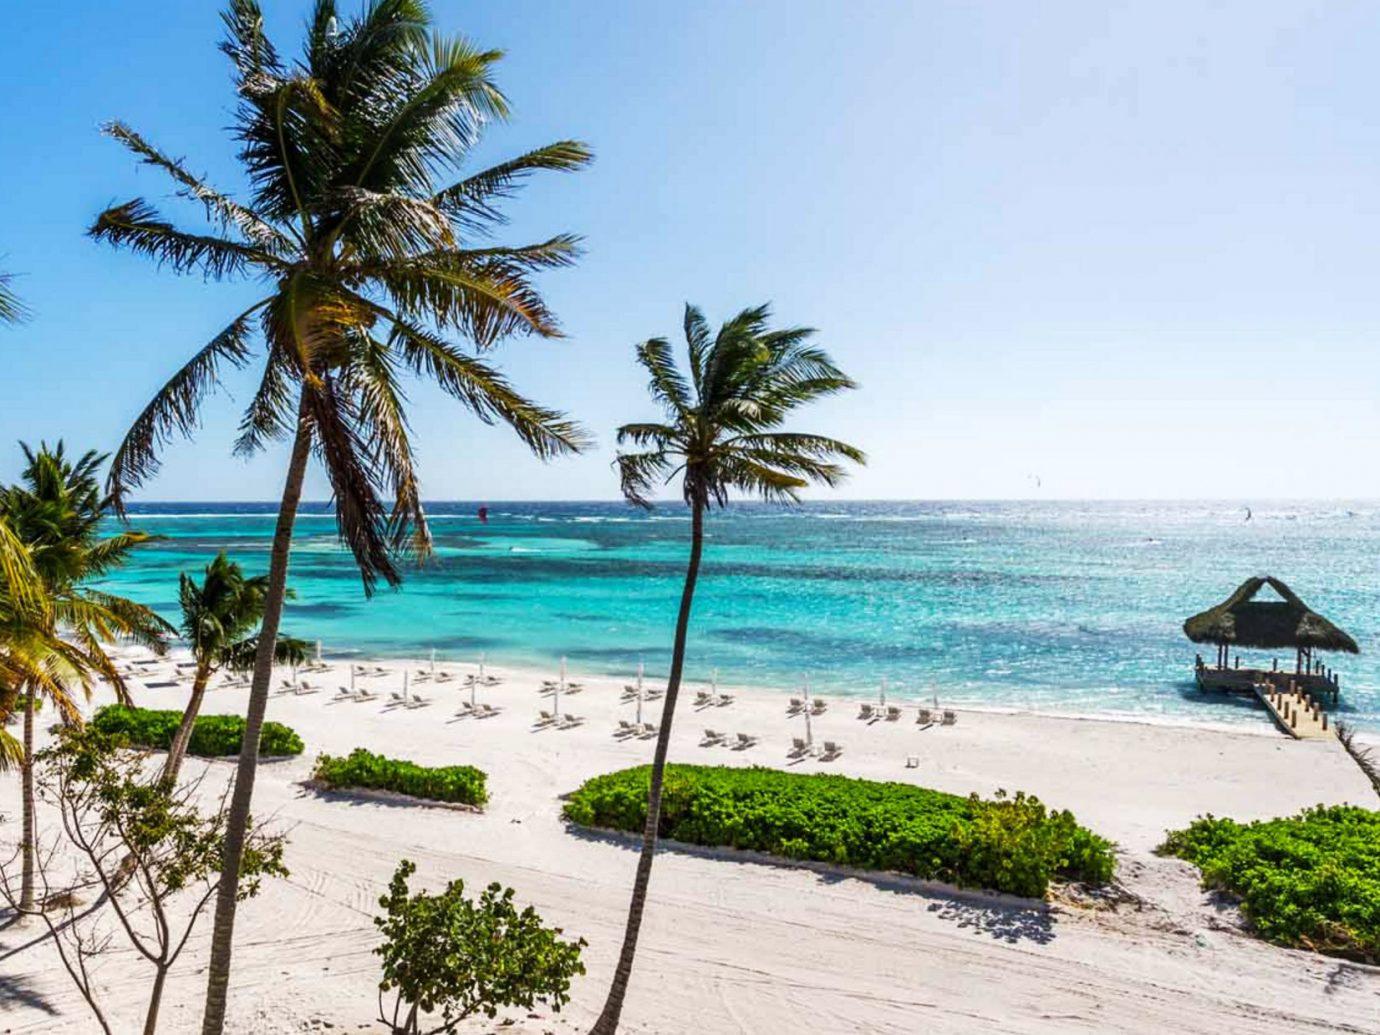 The Beach Outside The Westin Puntacana Resort In Dominican Republic